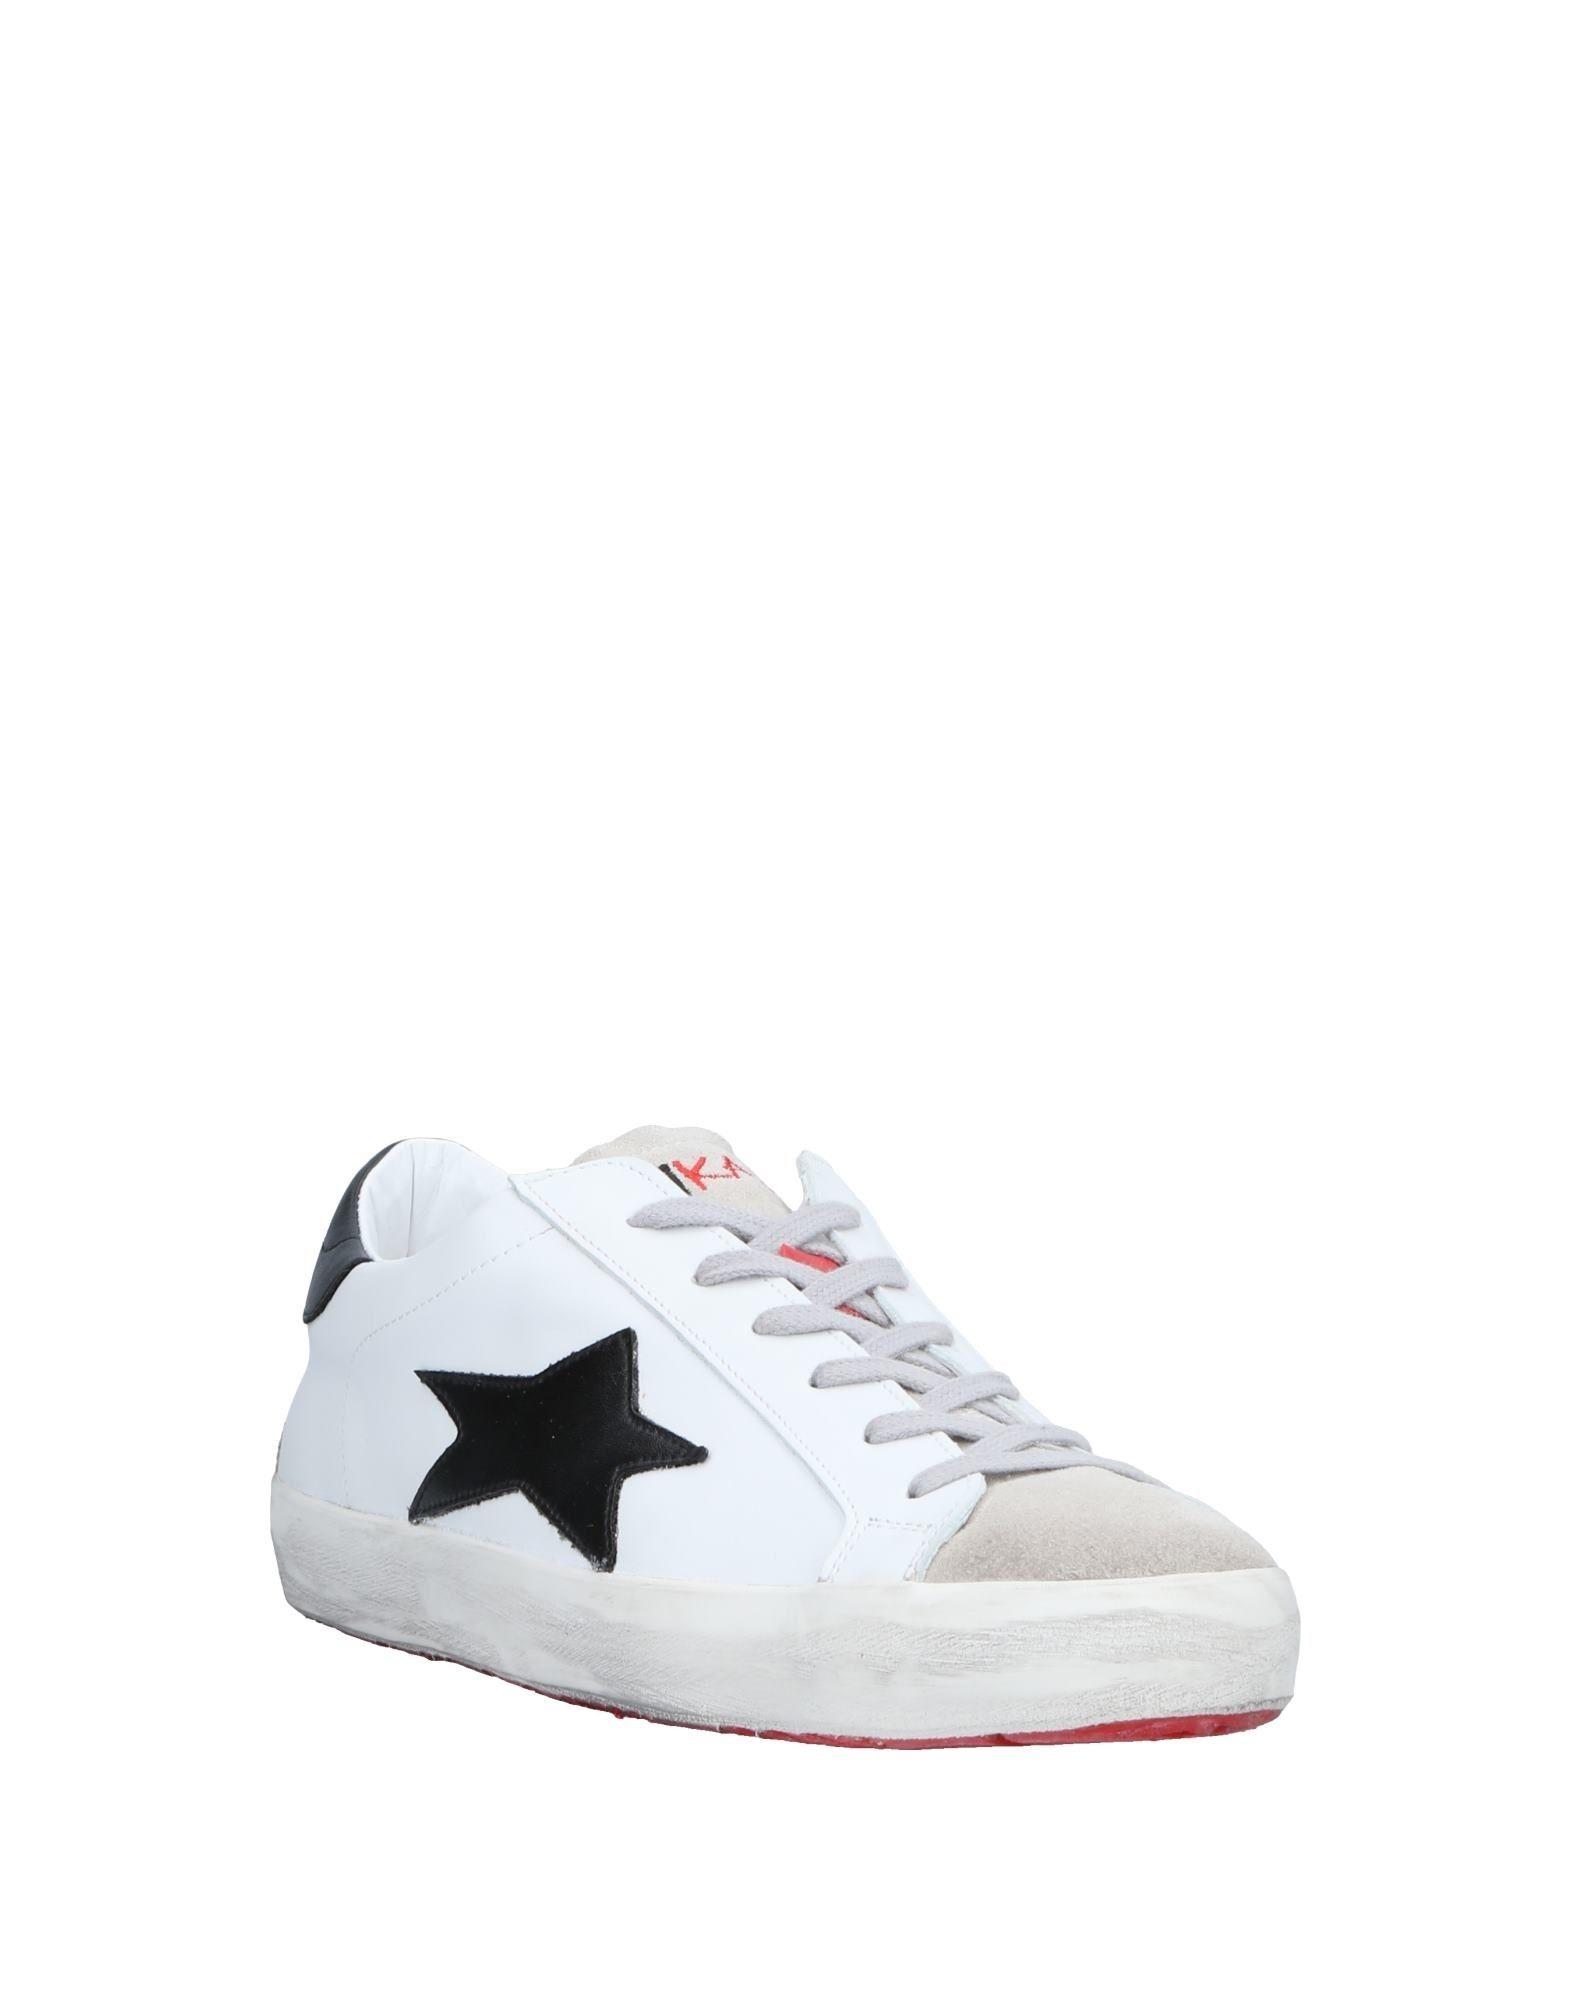 Ishikawa Sneakers Herren  11543935UT Gute Qualität beliebte Schuhe